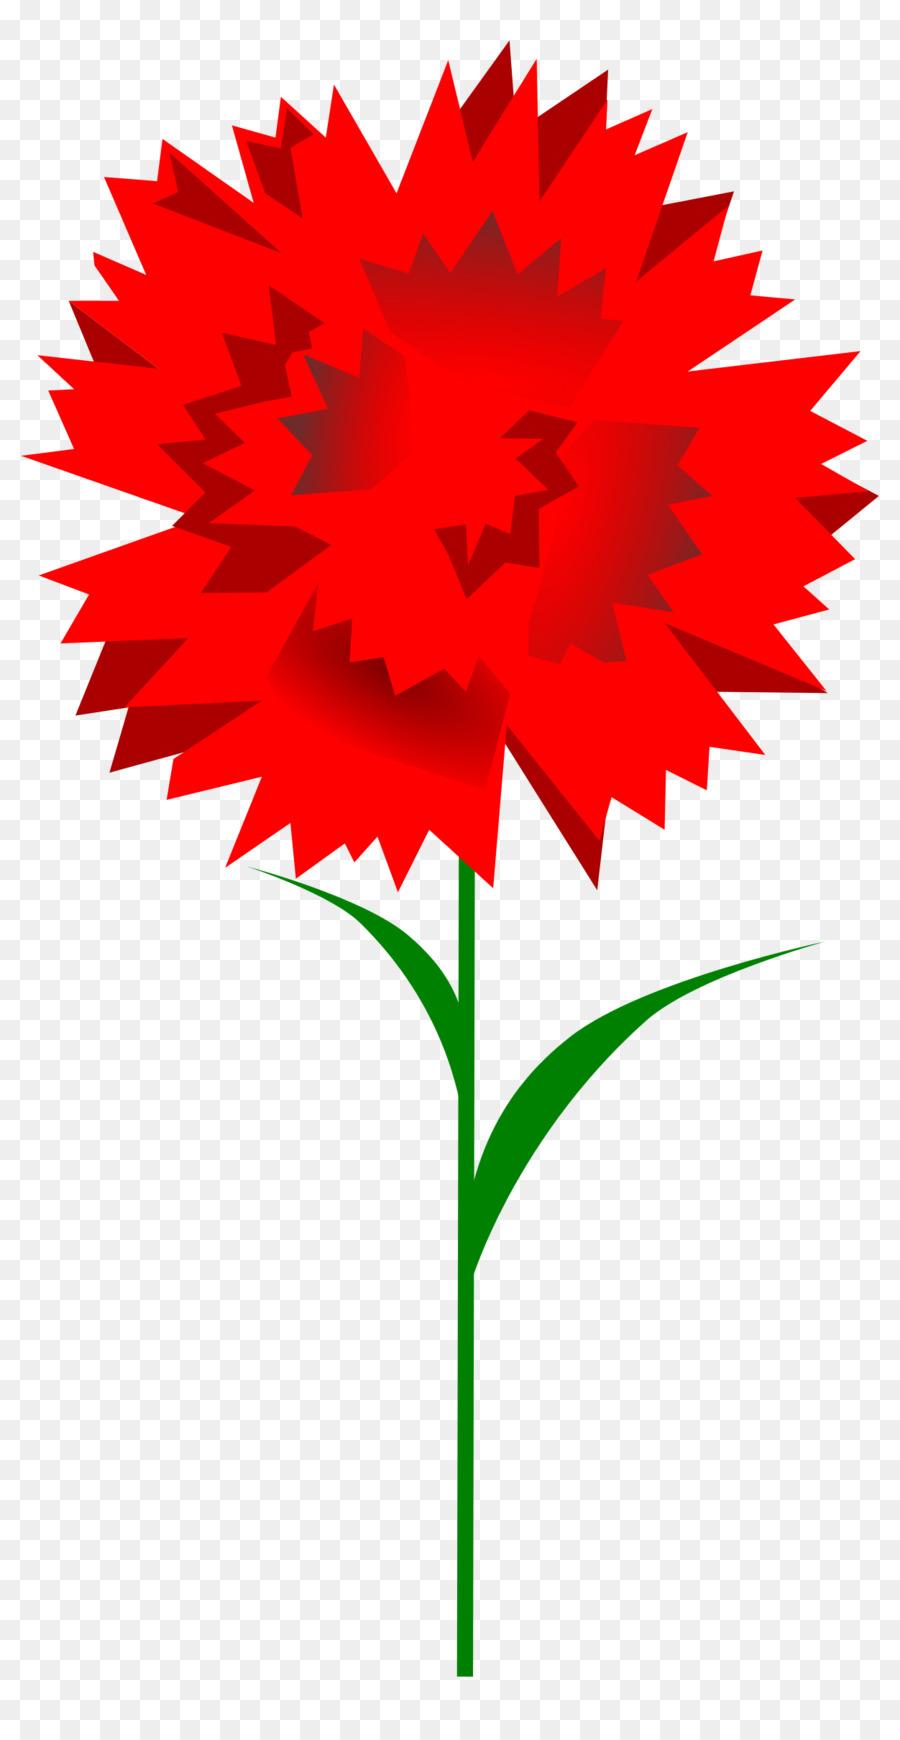 mattel logo stock photography clip art carnation png download rh kisspng com carnation image clipart pink carnation clipart